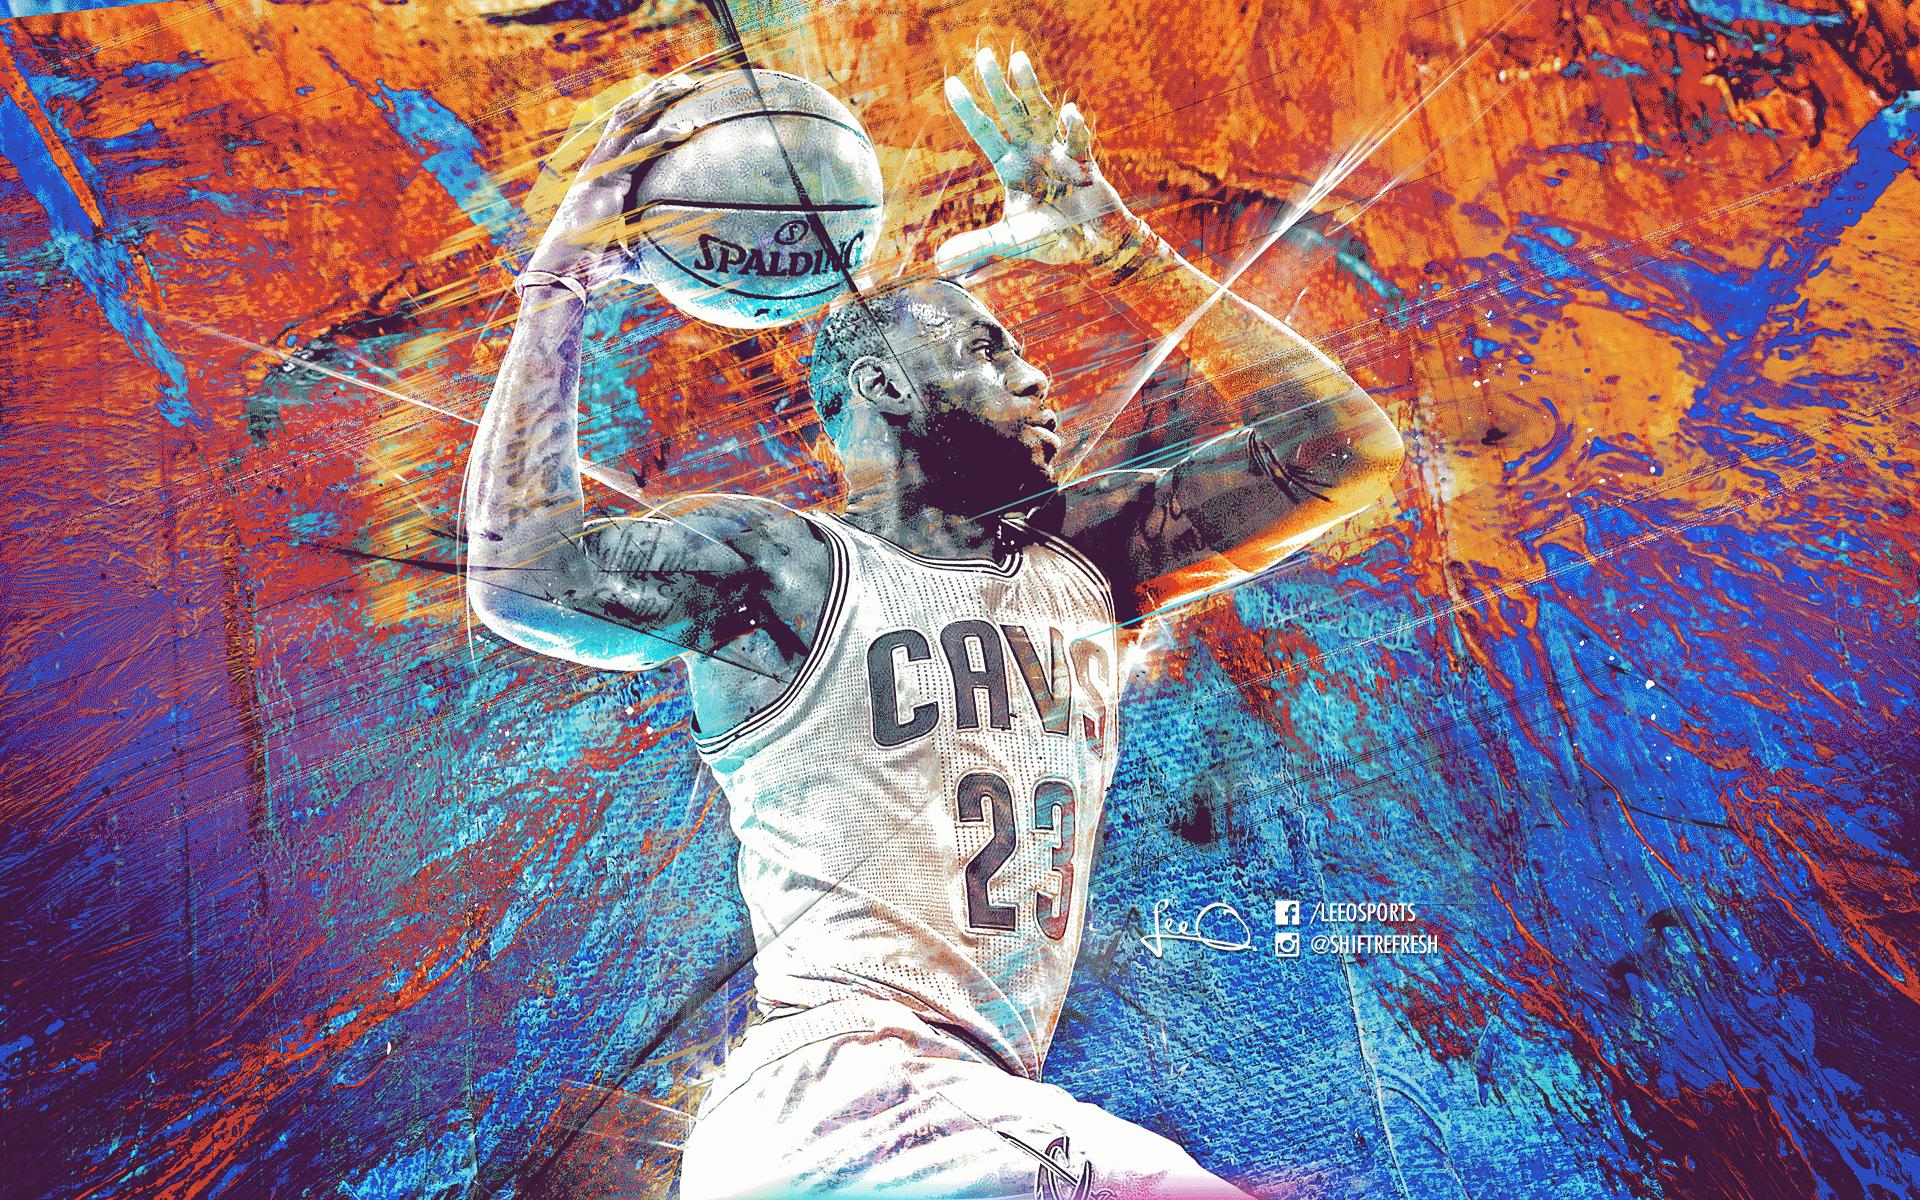 [97+] Lebron James Lakers Wallpapers on WallpaperSafari